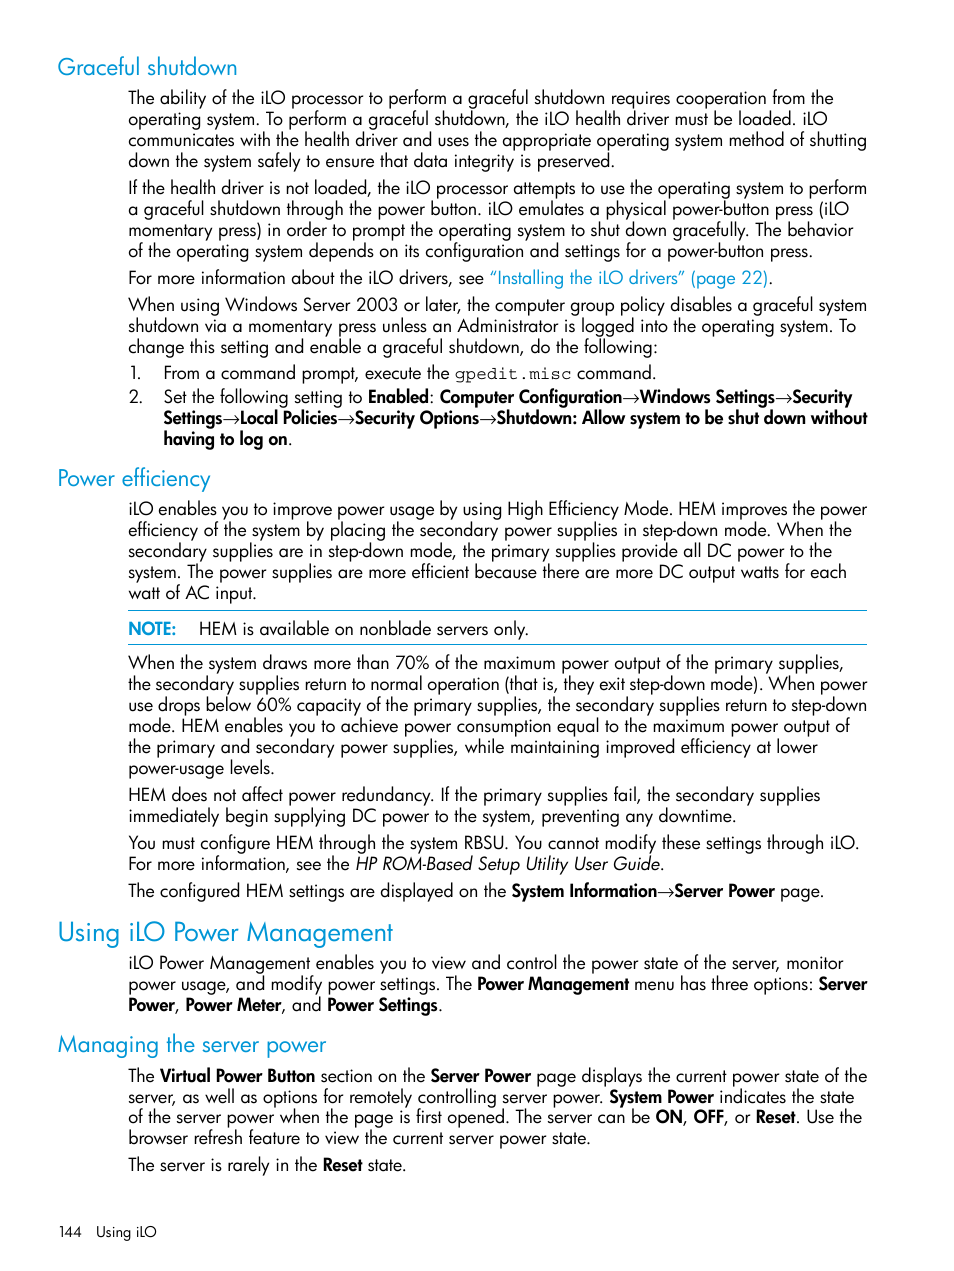 Graceful shutdown, Power efficiency, Using ilo power management   HP